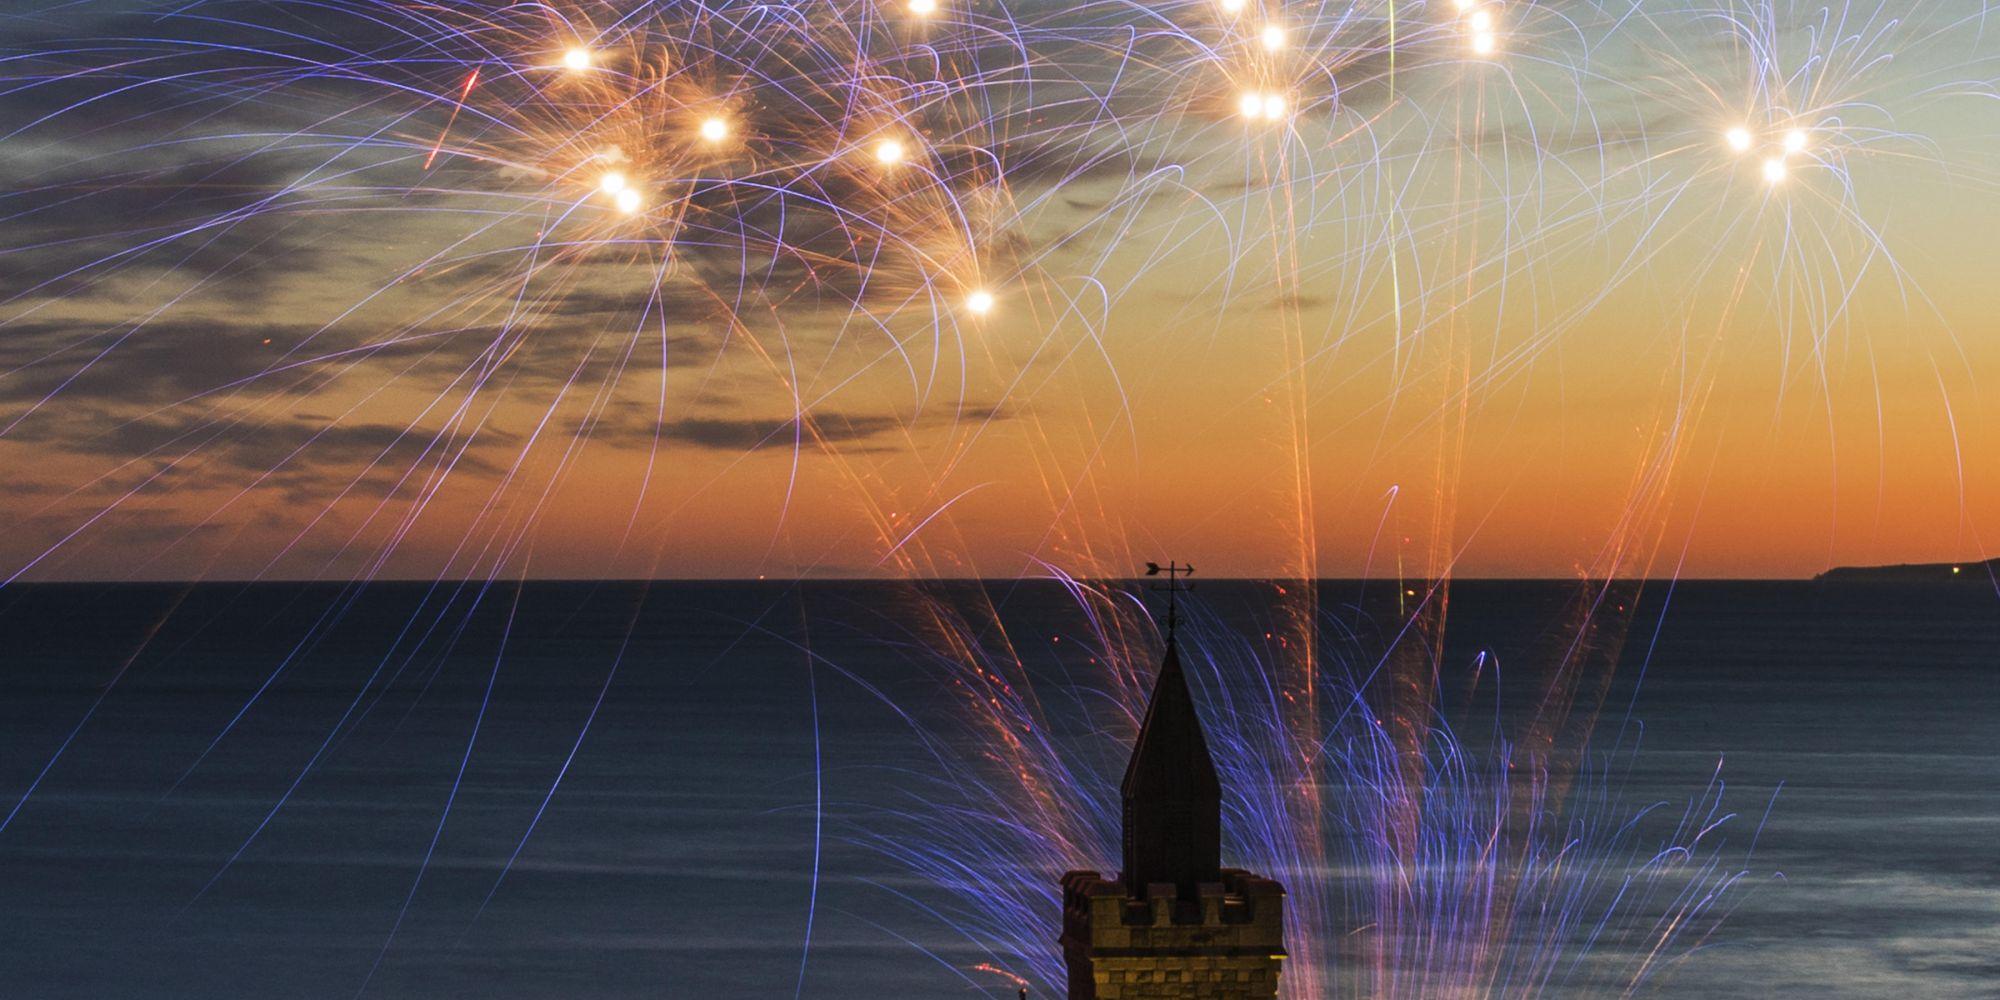 Fireworks in Porthleven